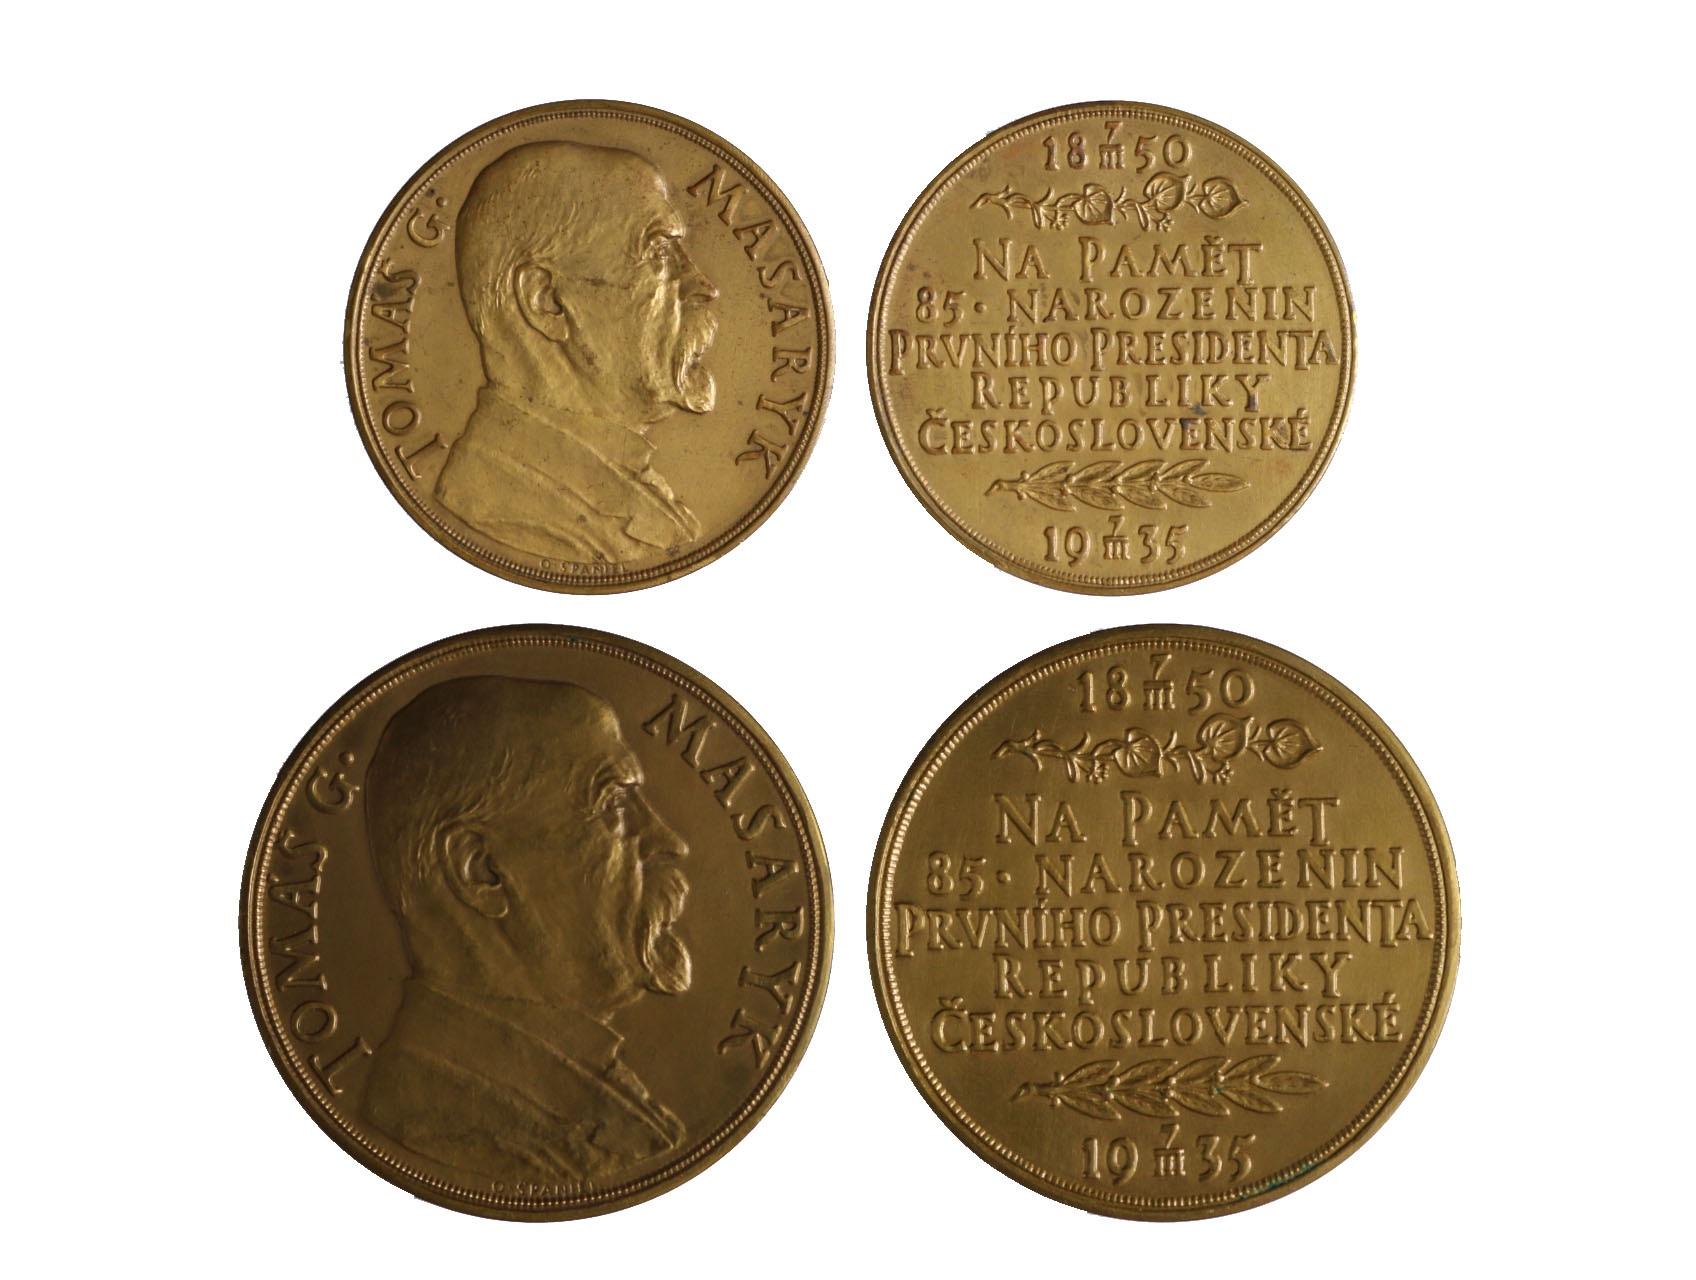 Španiel Otakar 1881-1955 - 2 ks. Medailí na paměť 85. narozenin prvního presidenta Republiky Československé, AE medaile průměr 50 mm a 60 mm,